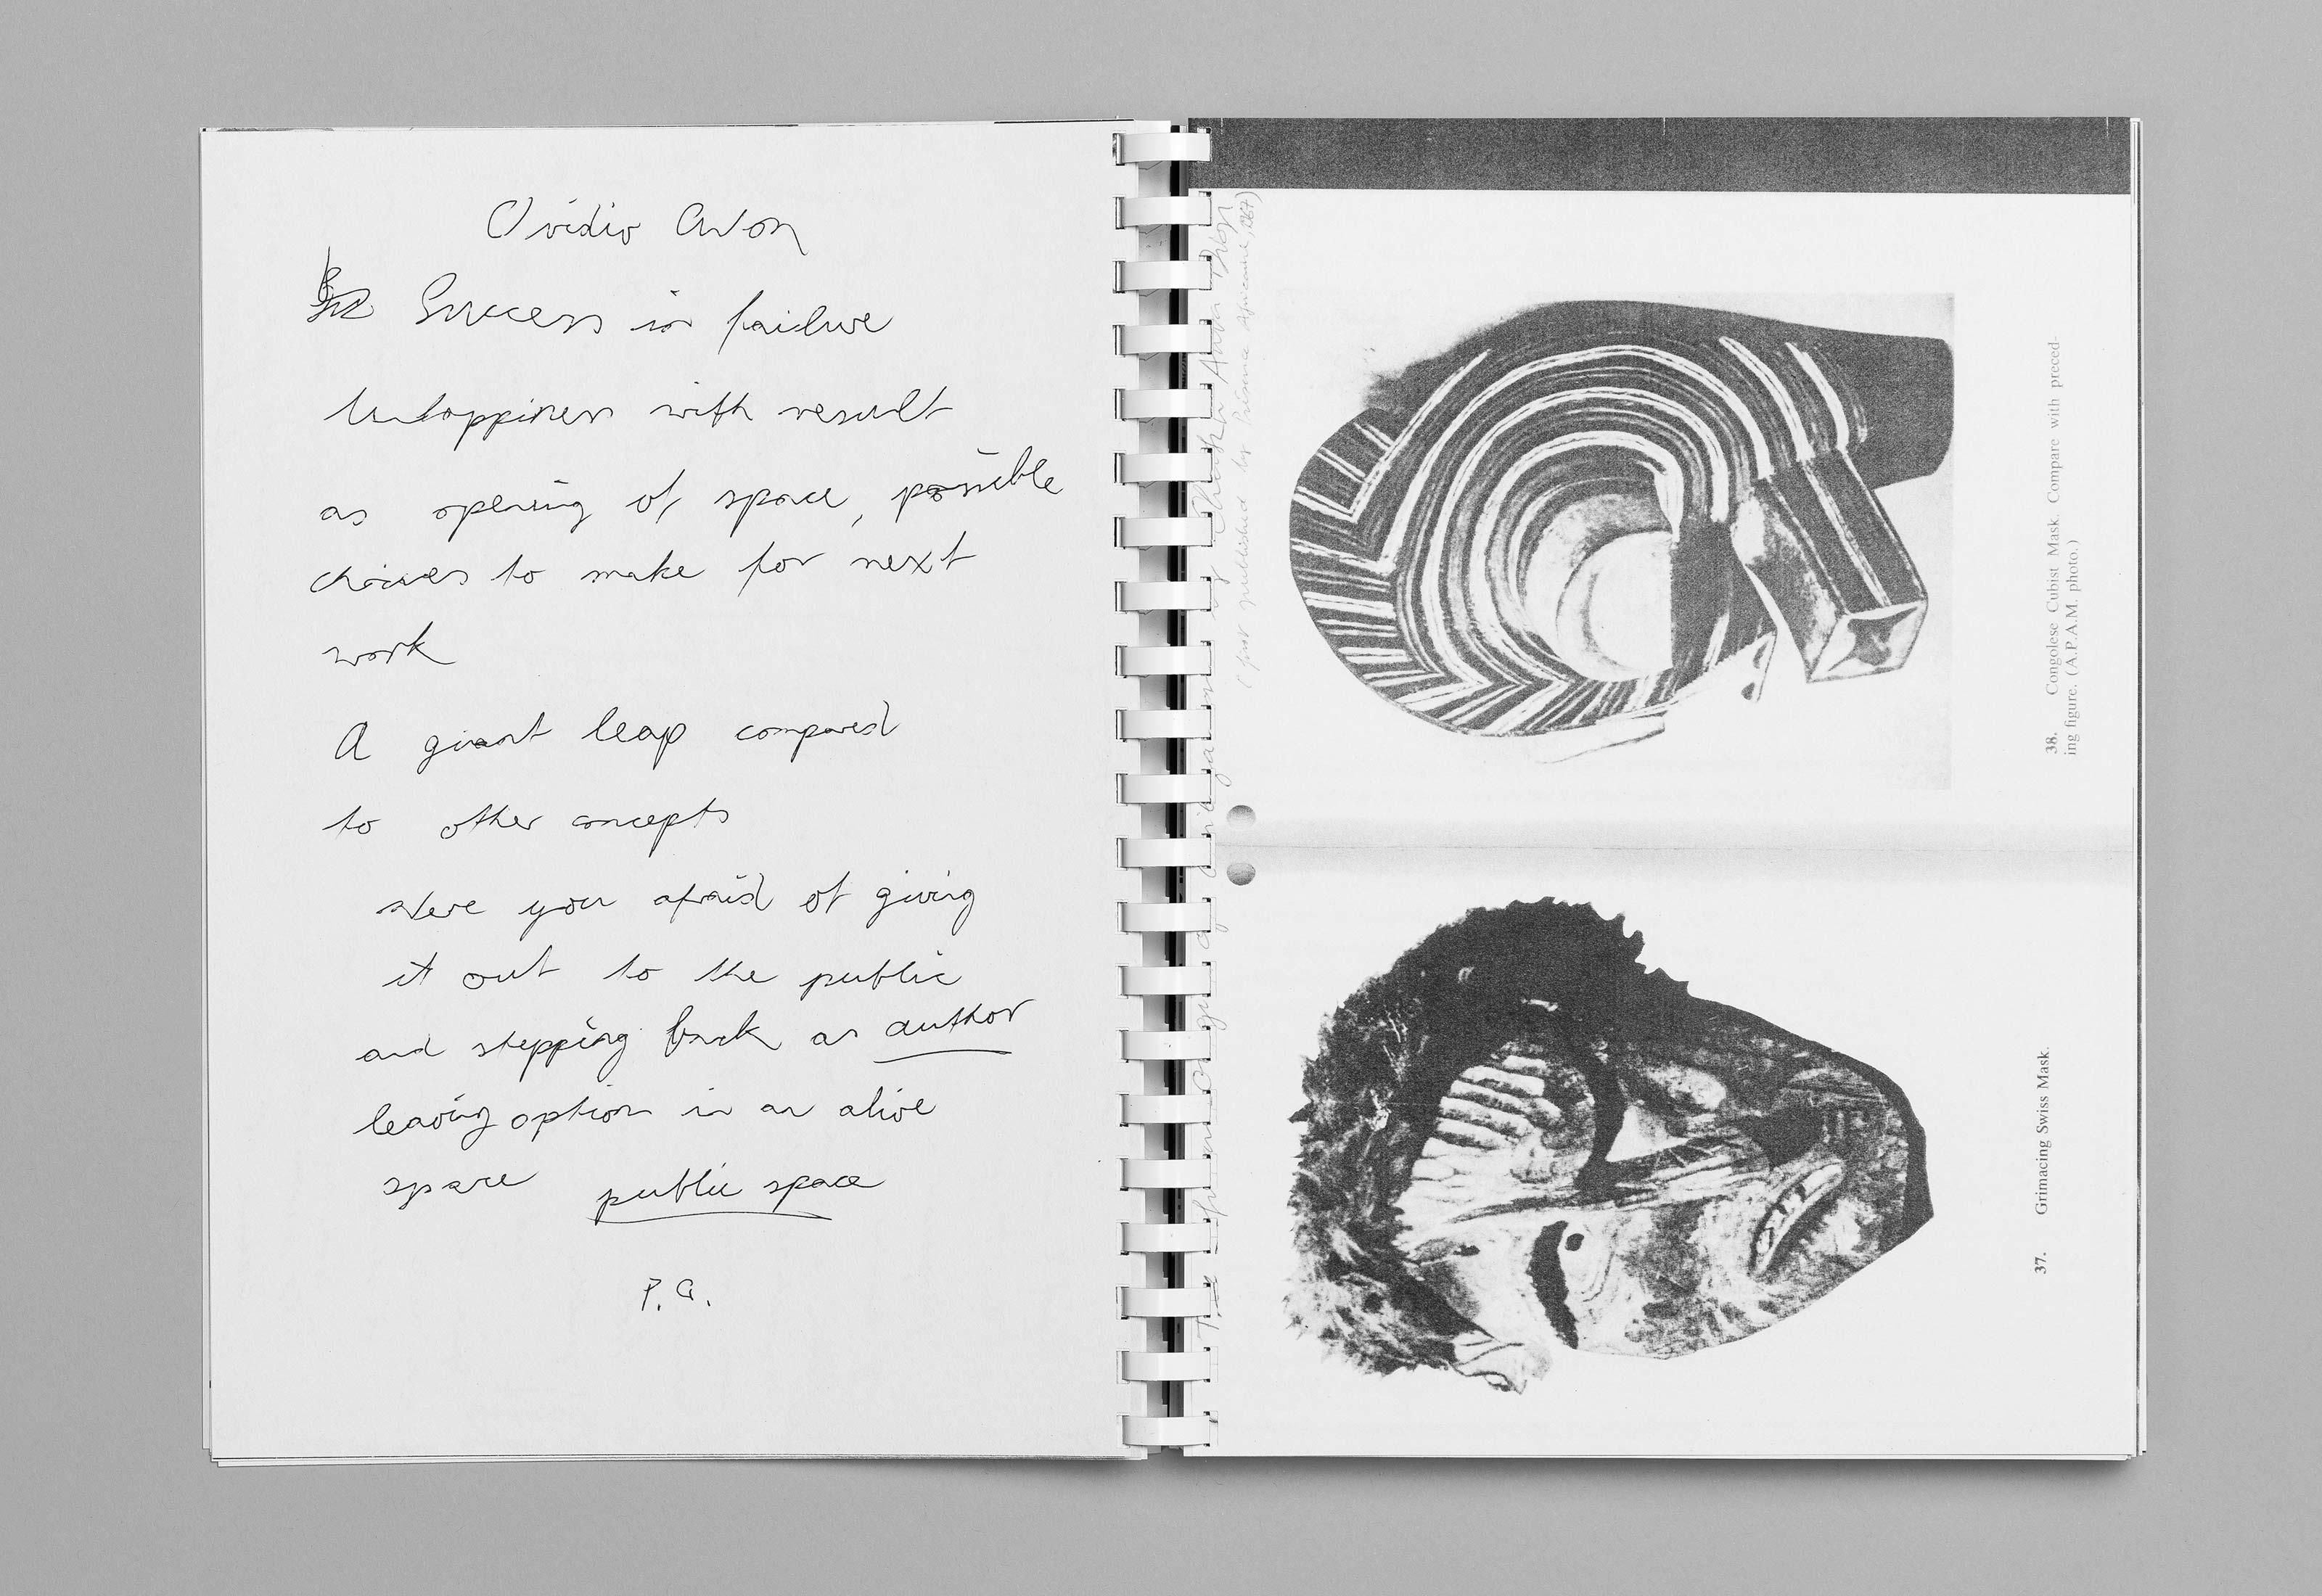 Sommerakademie im Zentrum Paul Klee 2016 – Publikation Thomas Hirschhorn, 03  ©Atelier Pol